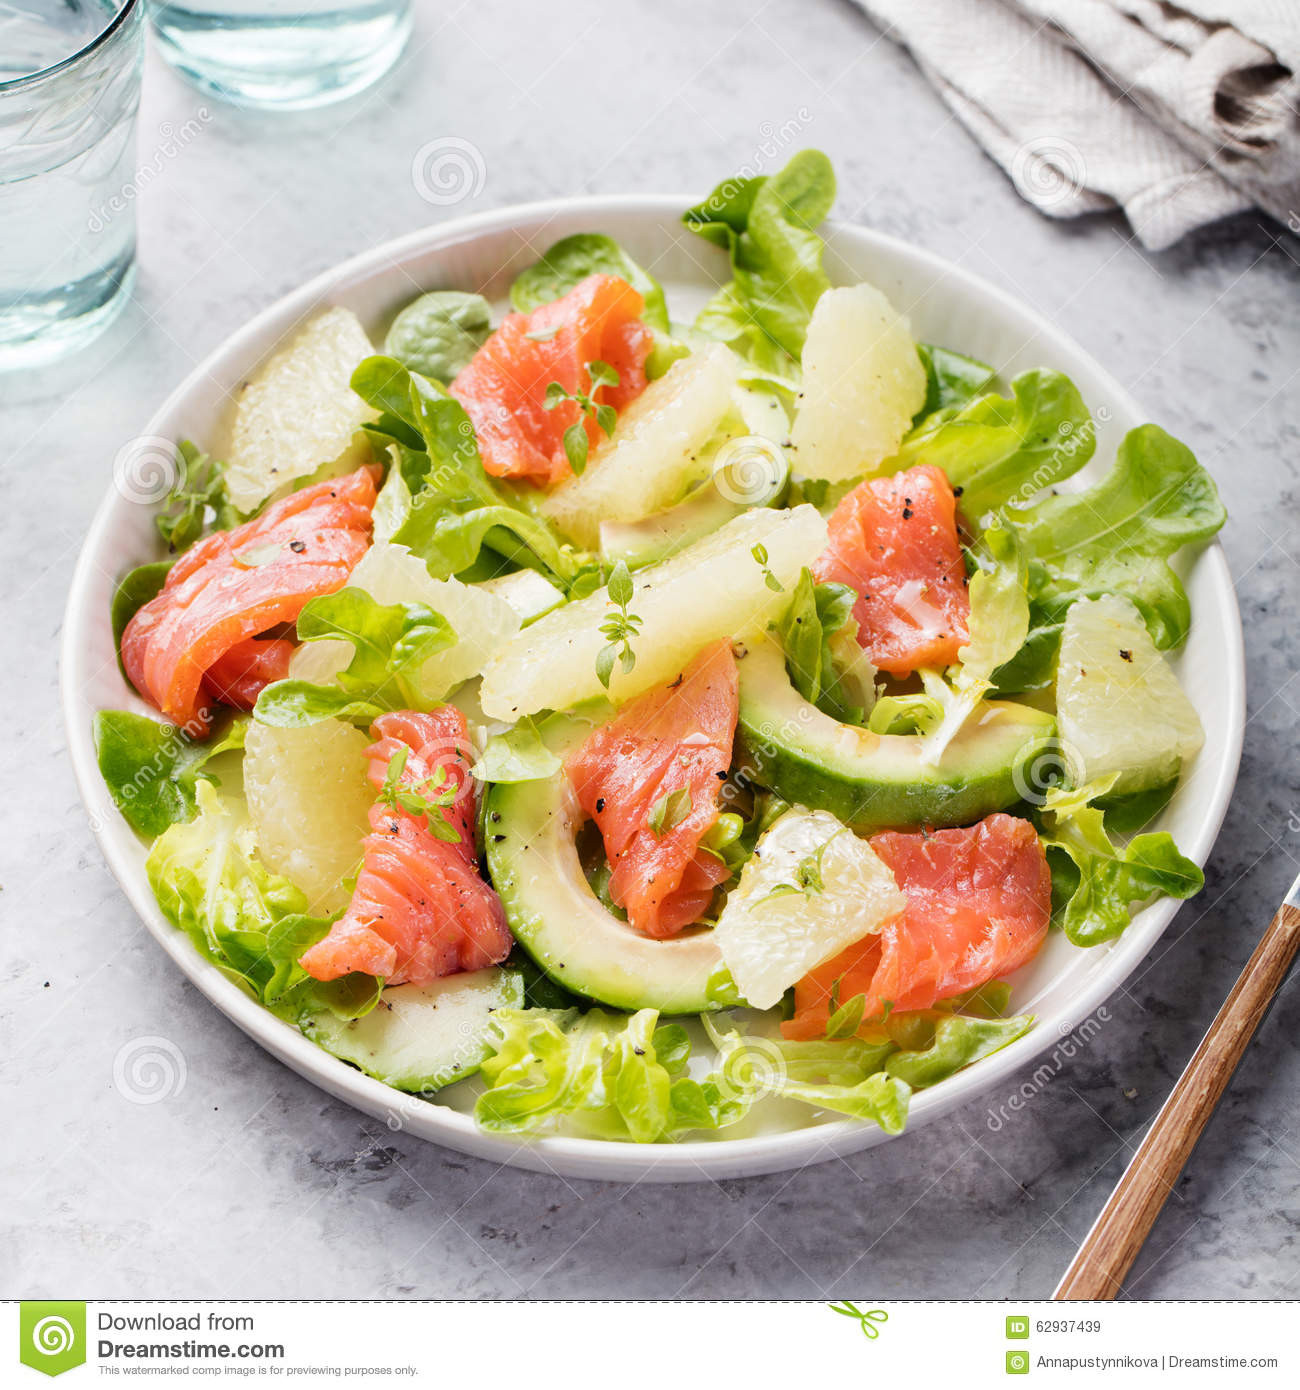 Healthy Salmon Salad  Smoked Salmon Salad With Avocado Grapefruit Stock